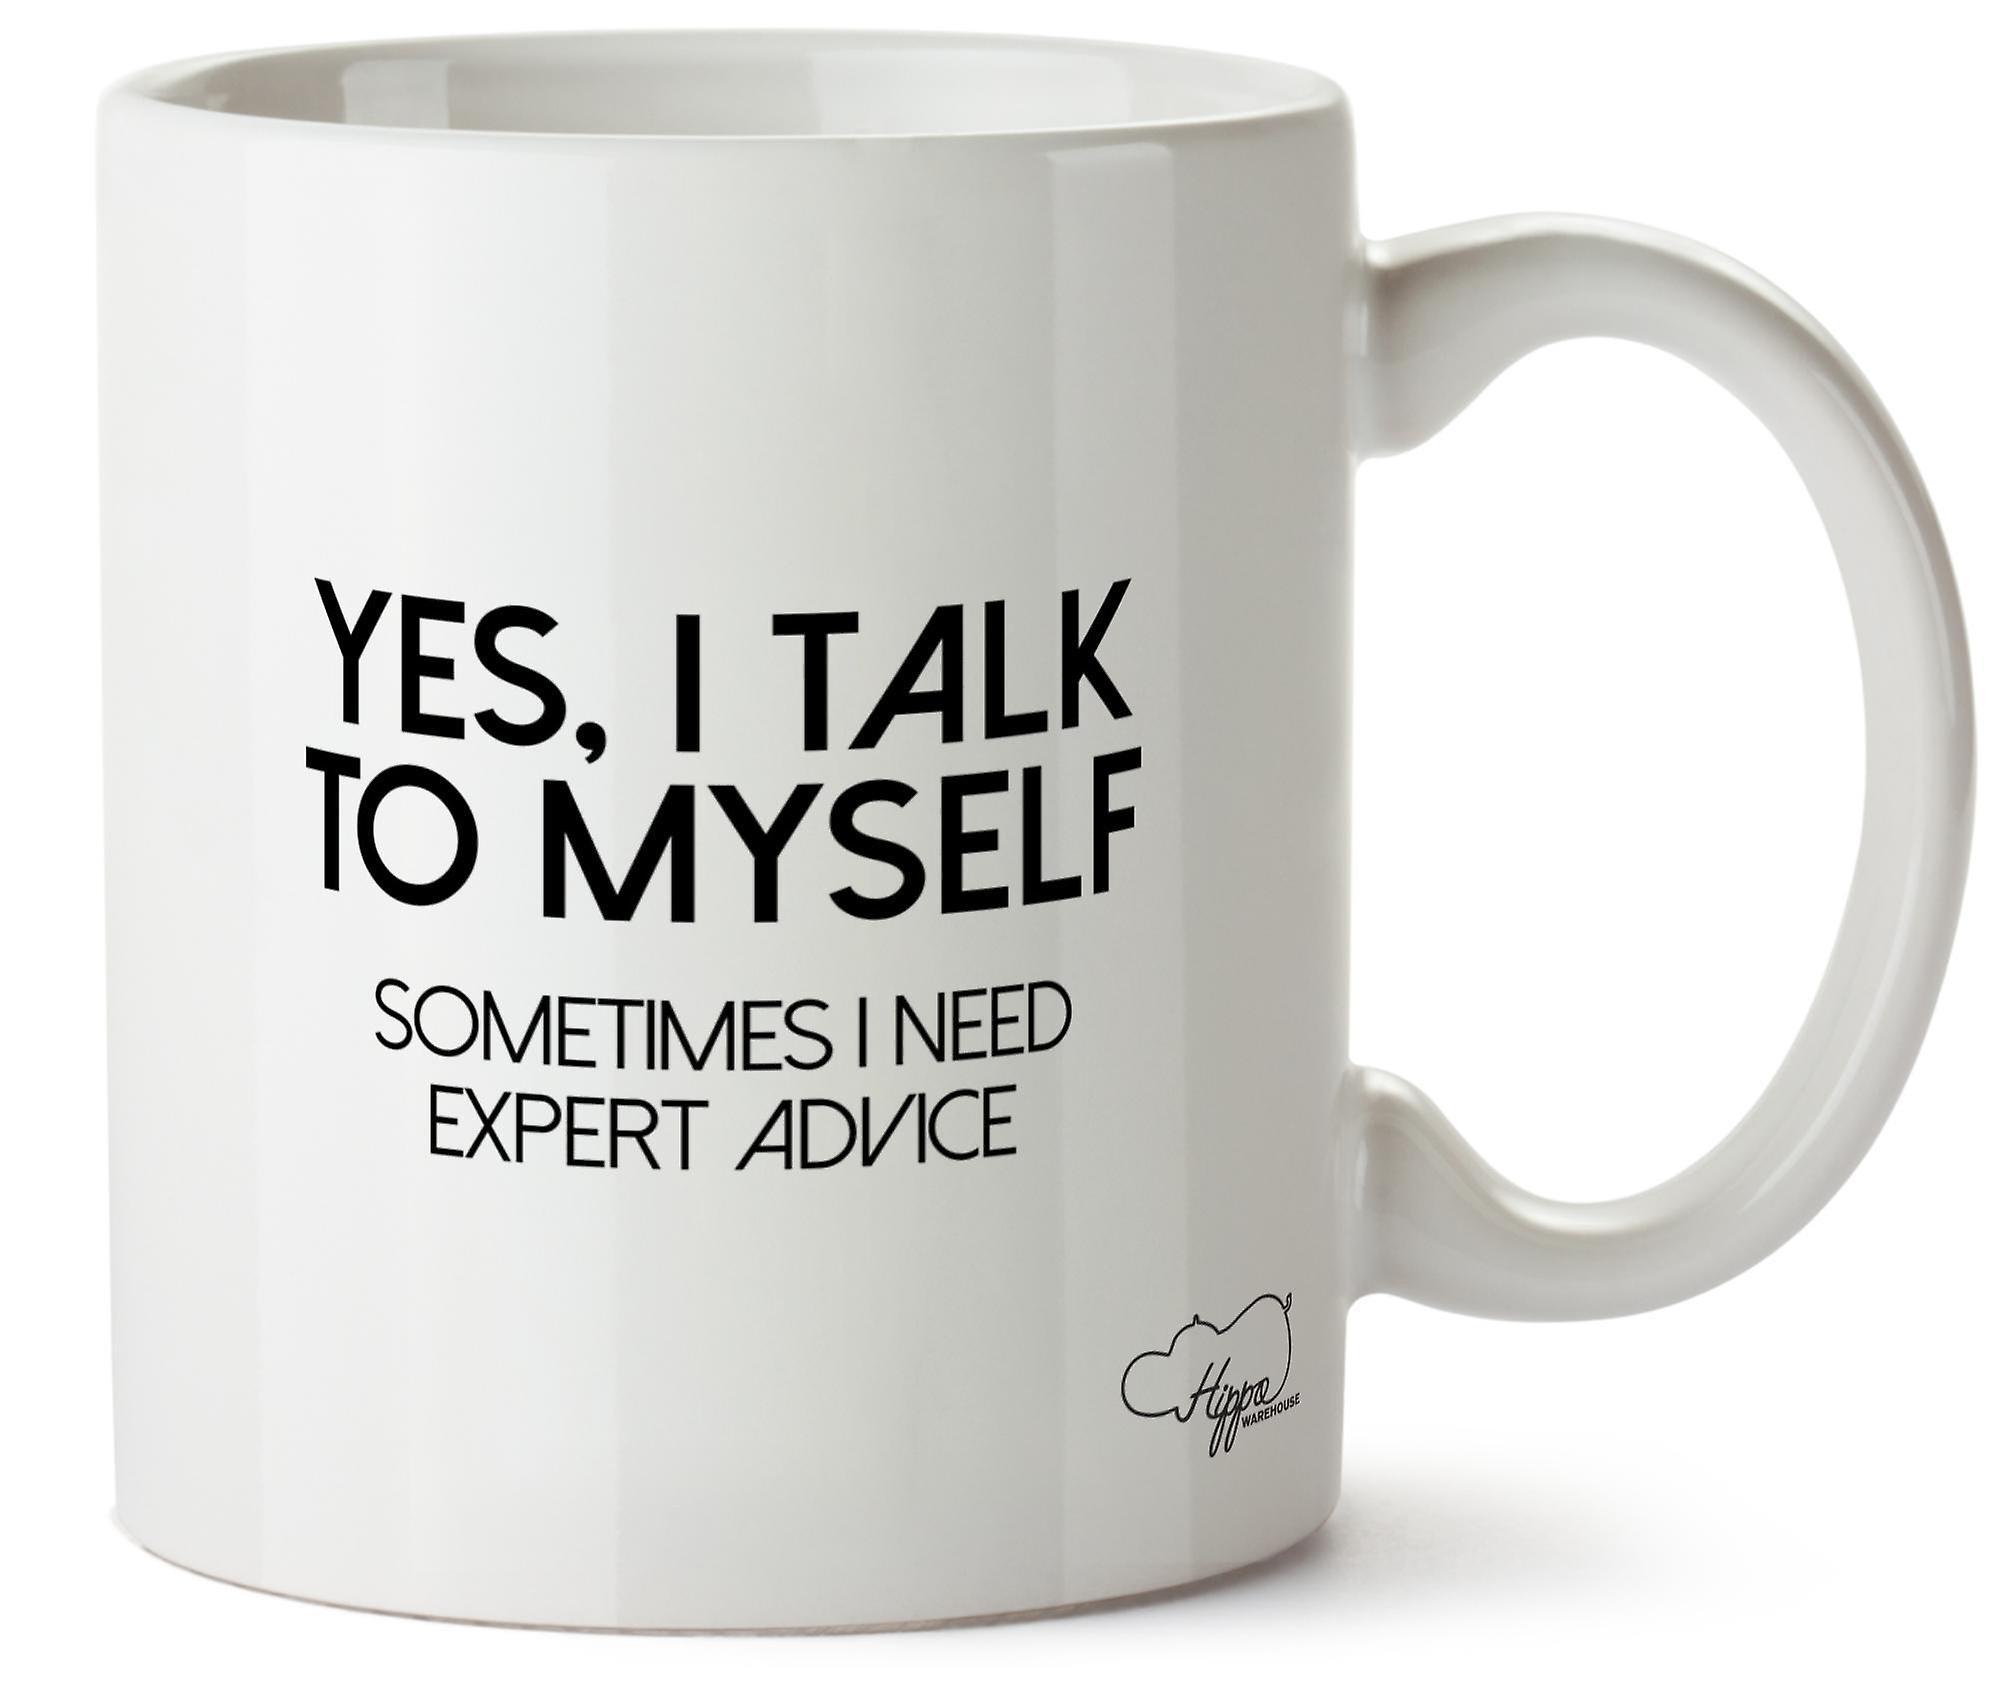 Hippowarehouse Yes I Talk To Myself Sometimes I Need Expert Advice Printed Mug Cup Ceramic 10oz